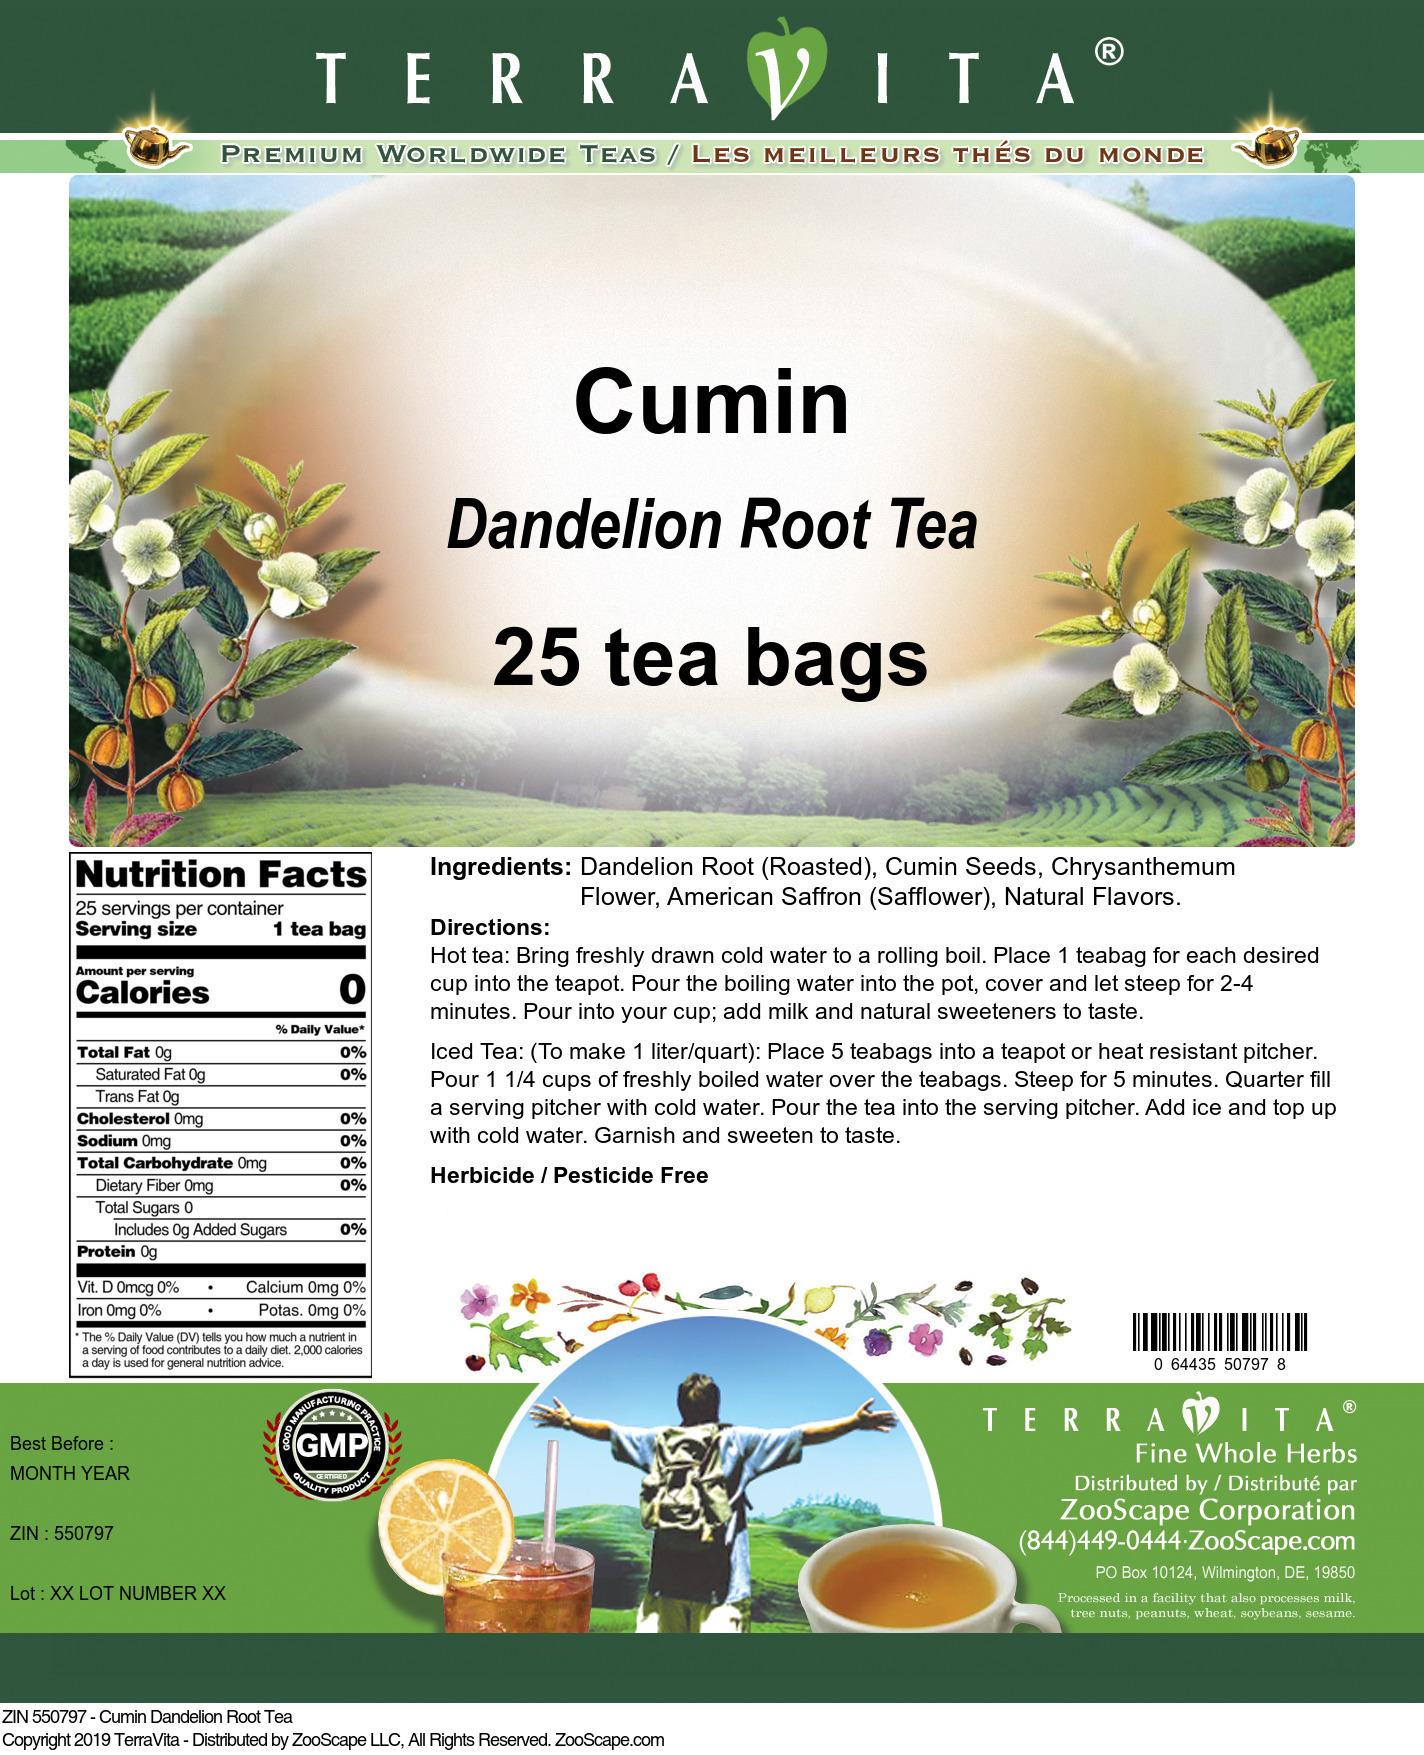 Cumin Dandelion Root Tea